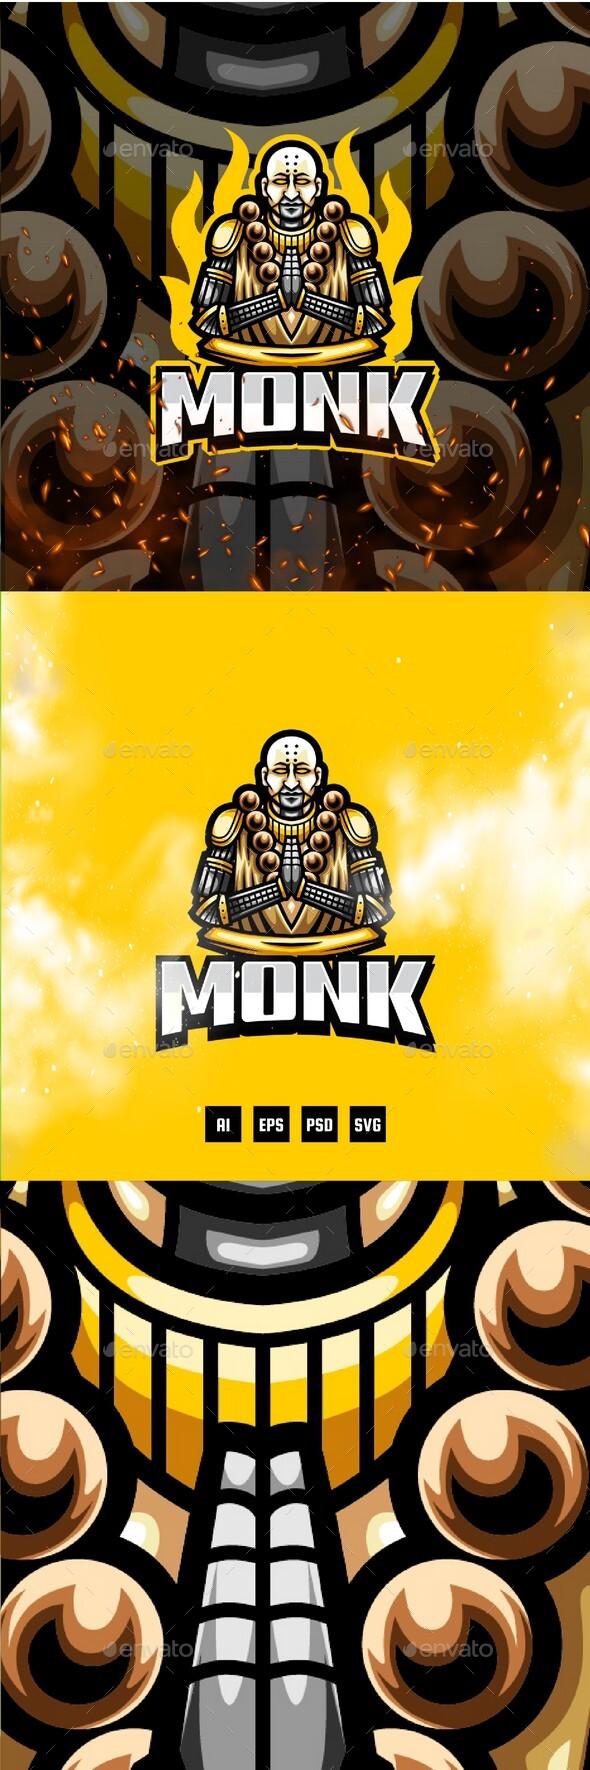 Monk E-Sport and Sport Logo Template